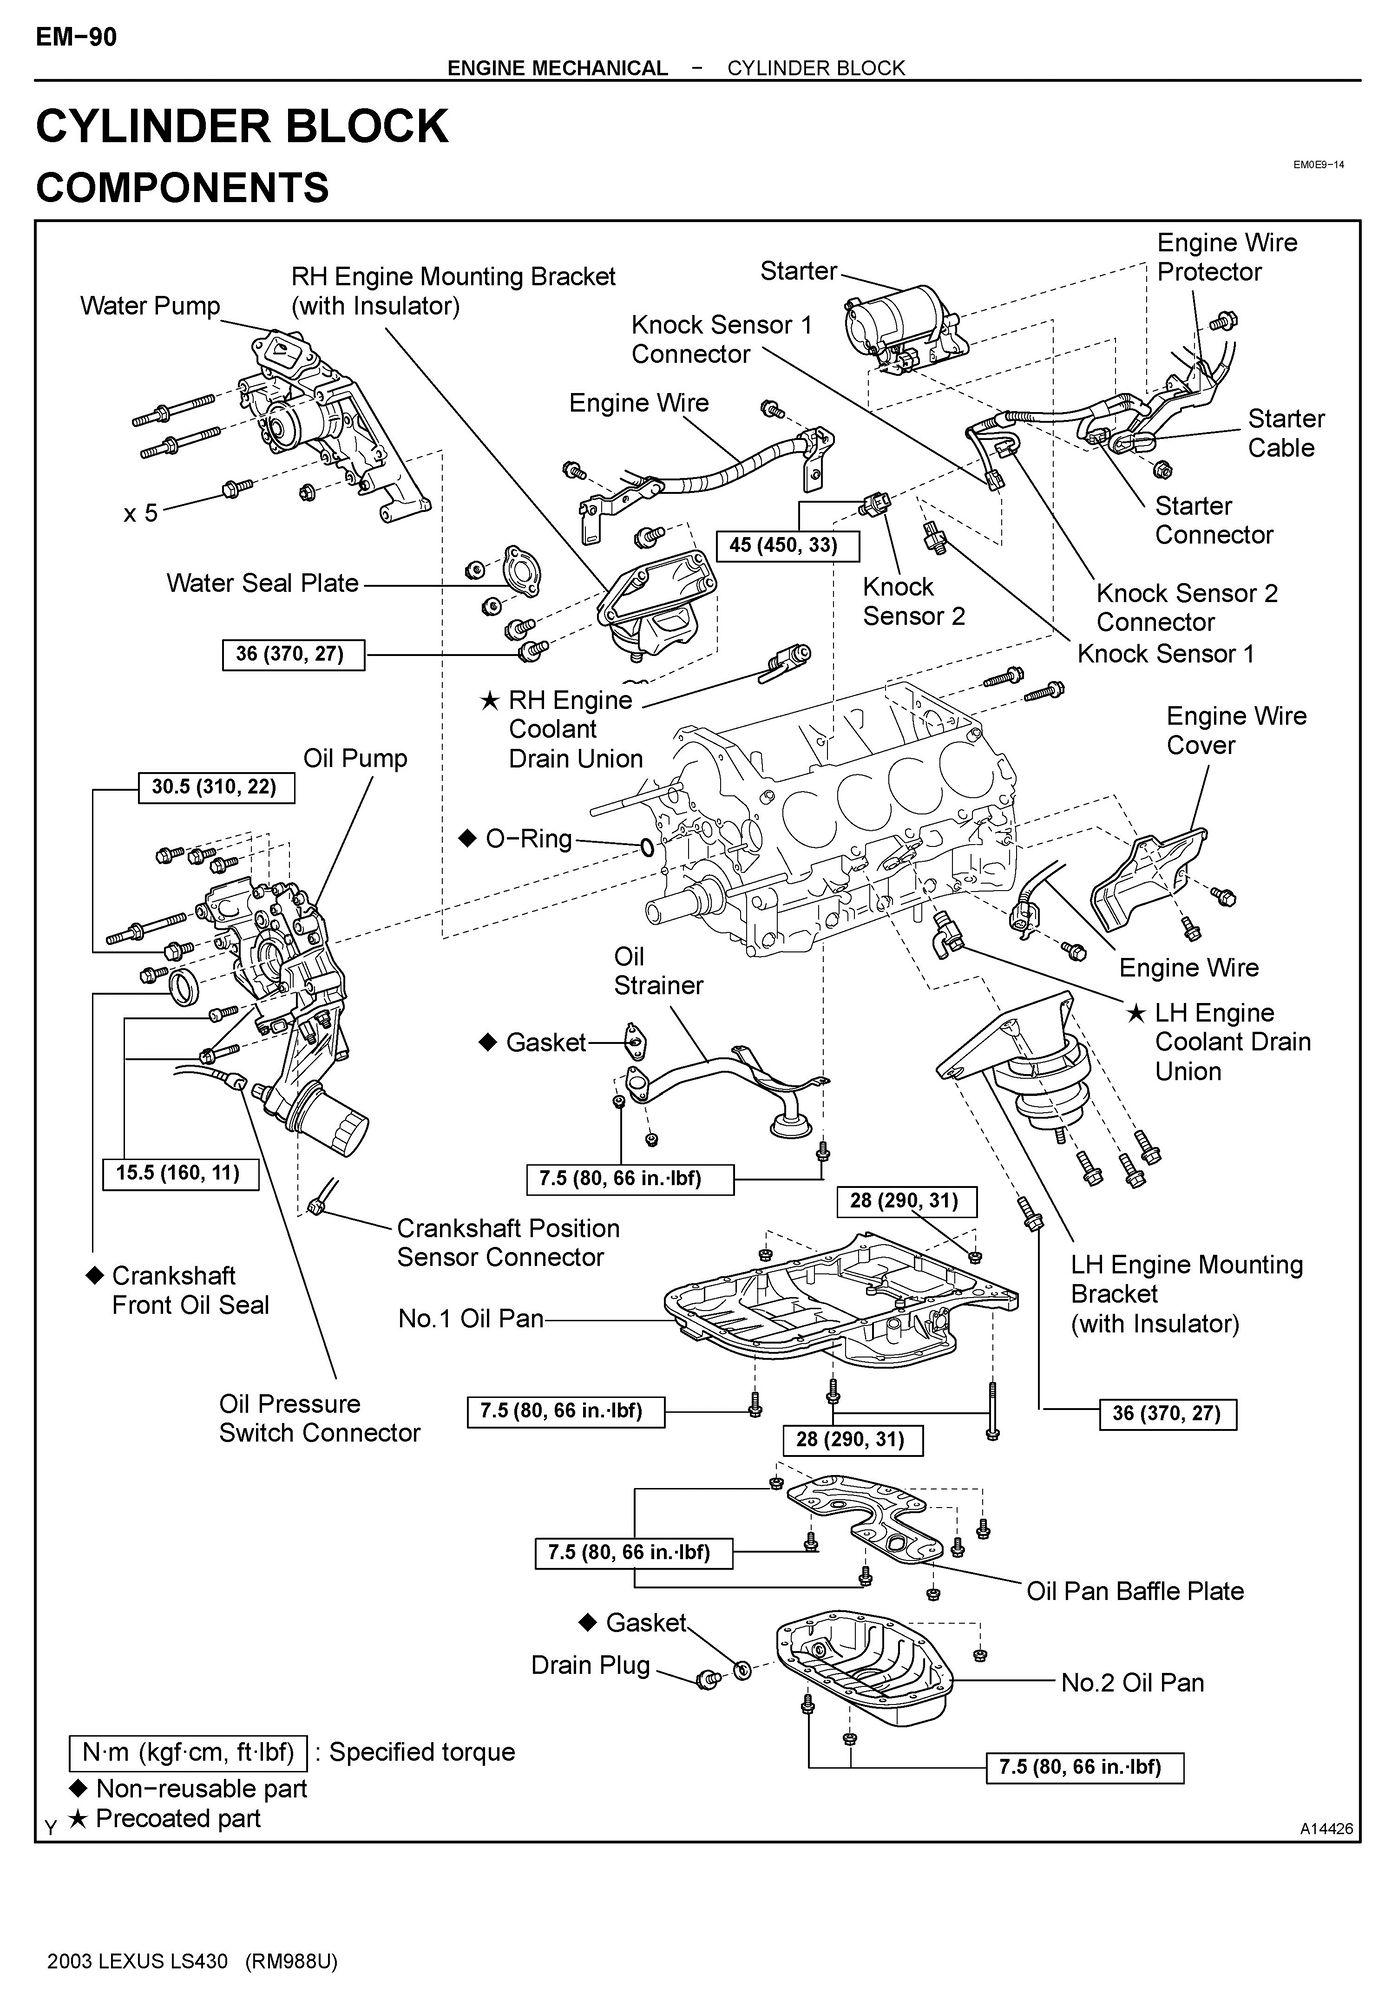 club car golf cart battery wiring diagram wiring diagram Club Car Golf Cart Turn Signal Wiring Diagram golf cart turn signal wiring diagram with 48 volt club car club car golf cart turn signal wiring diagram